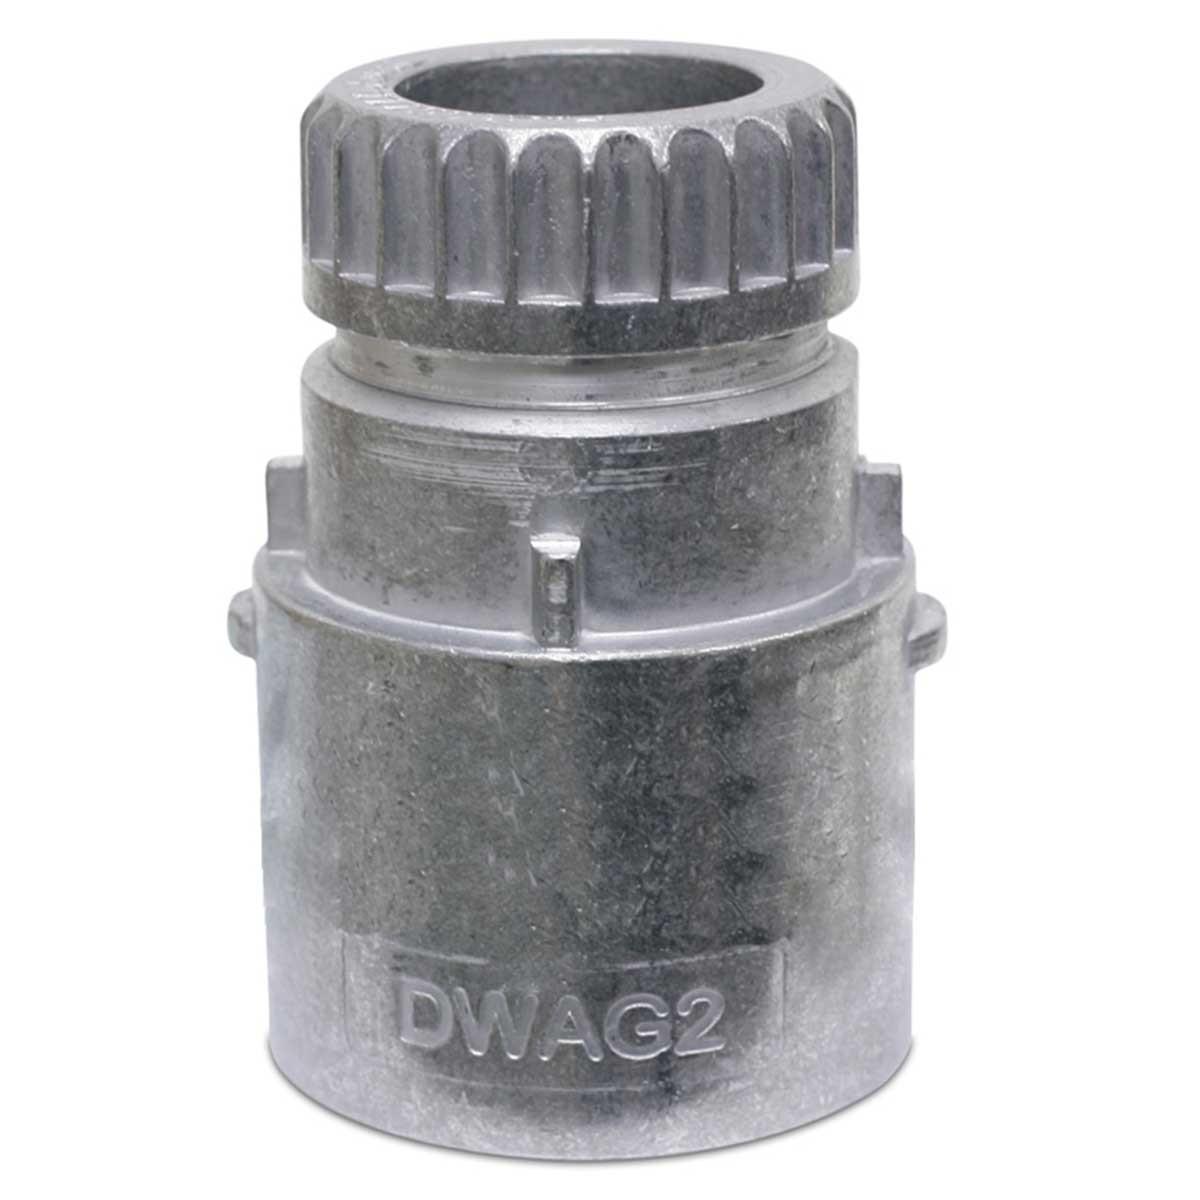 QuikDrive Adaptor for Dewalt Impact Drivers DWAG2